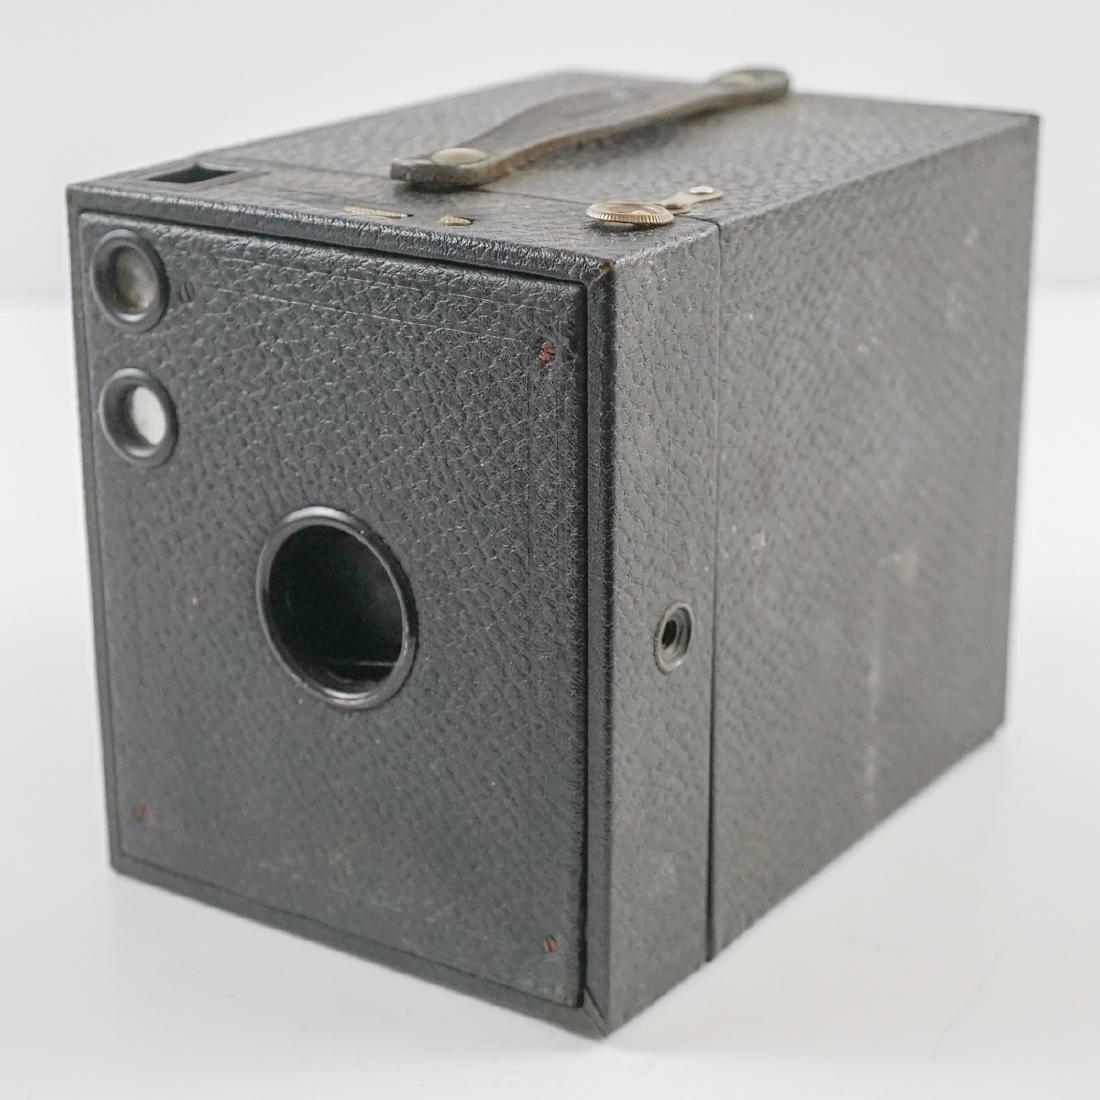 Kodak Brownie No. 3 Camera with Box - 2